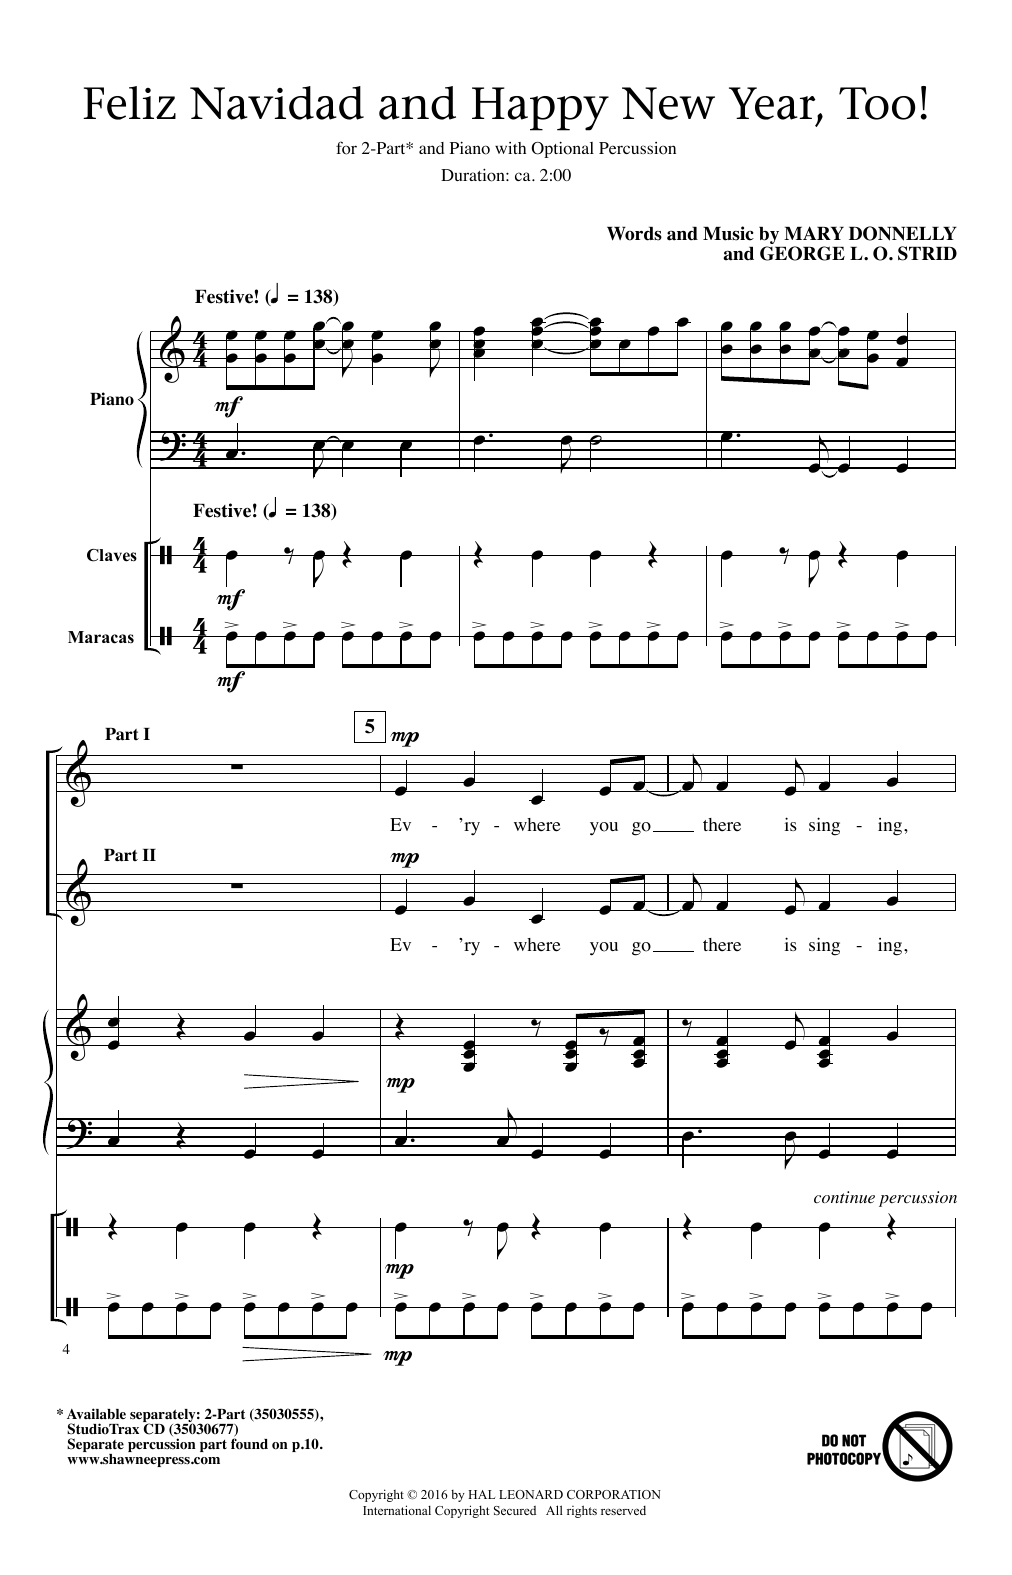 feliz navidad chords pdf